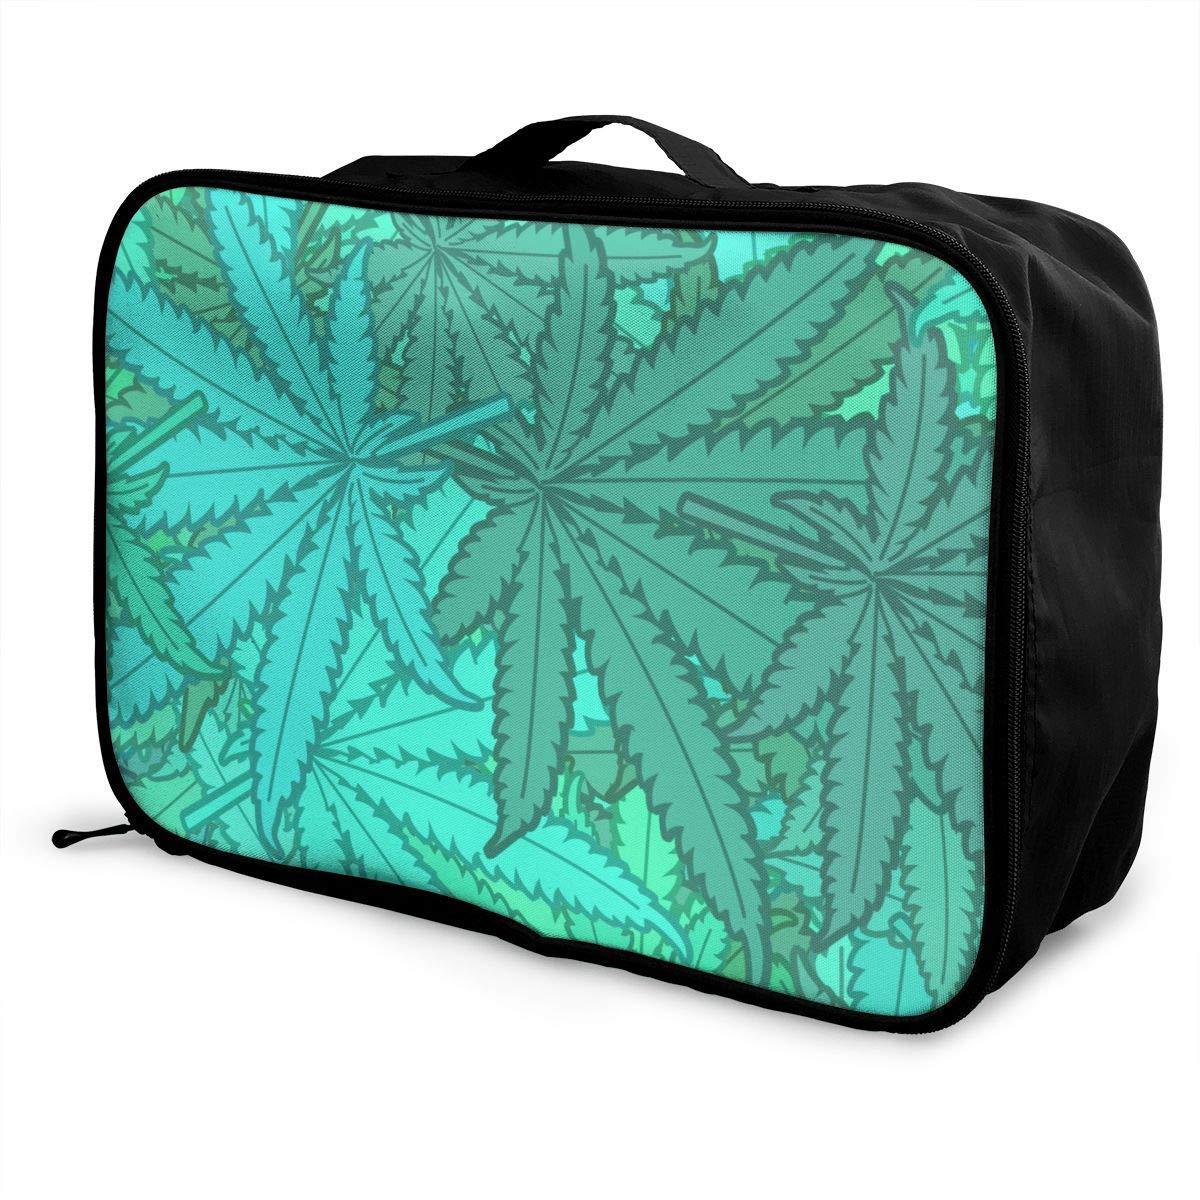 Travel Duffel Bag Waterproof Fashion Lightweight Large Capacity Portable Duffel Bag for Men /& Women Marijuana Leaf Weed Green JTRVW Luggage Bags for Travel